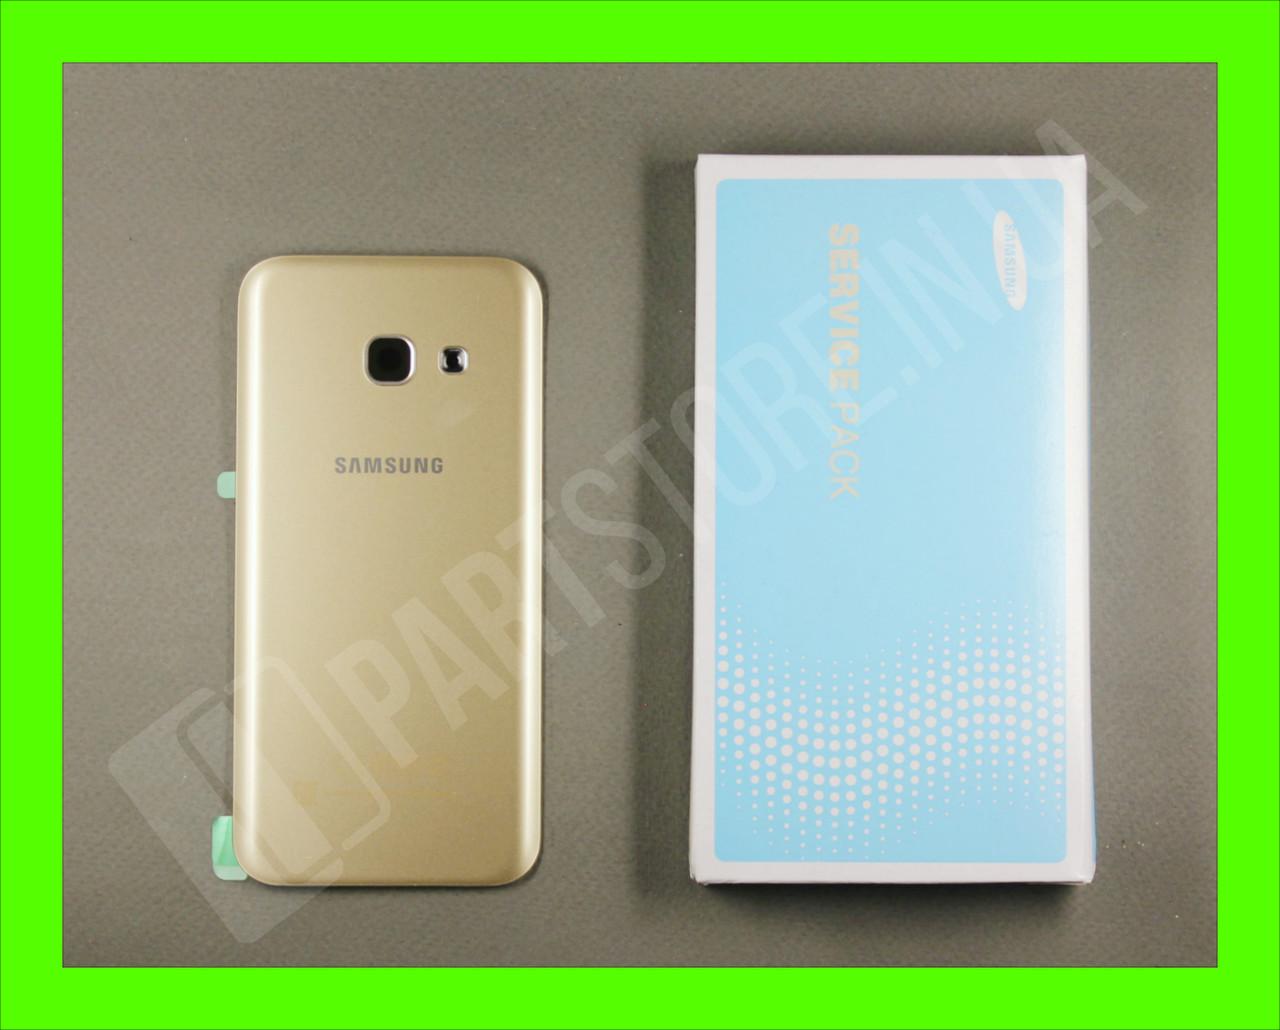 Cервисная оригинальная задняя Крышка Samsung A320 Gold A3 2017 (GH82-13629B)